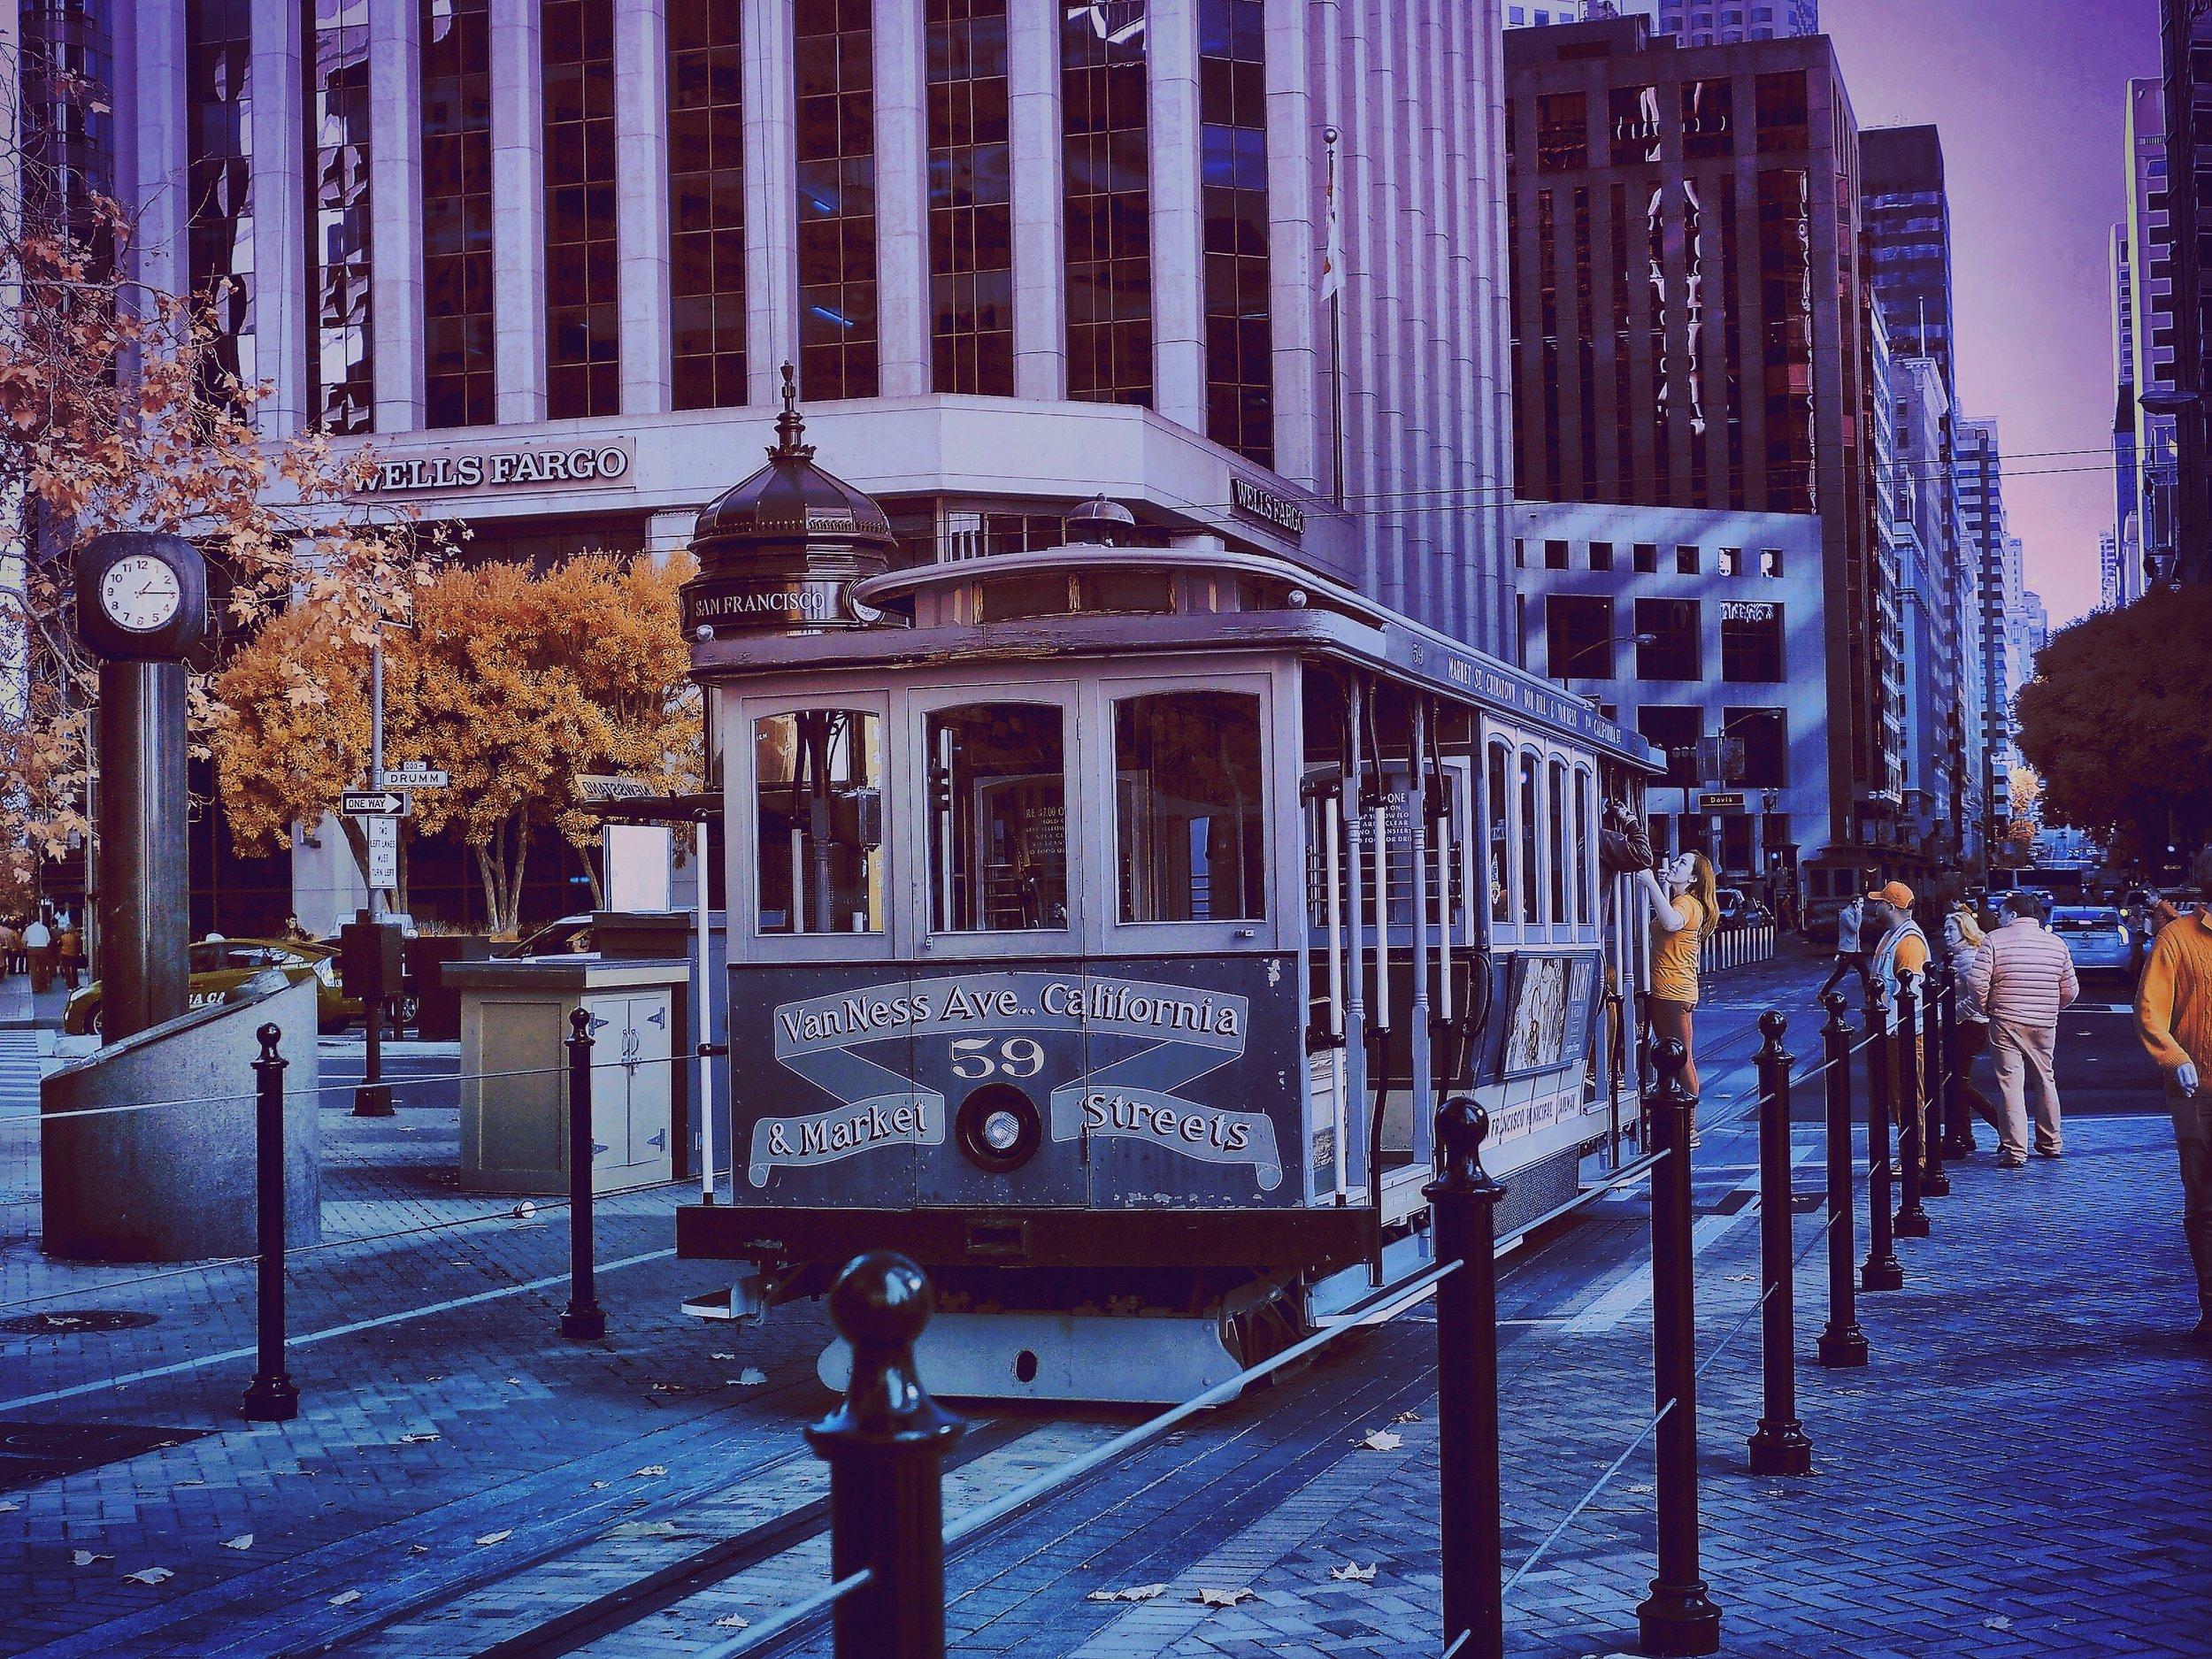 Mission Street Trolley